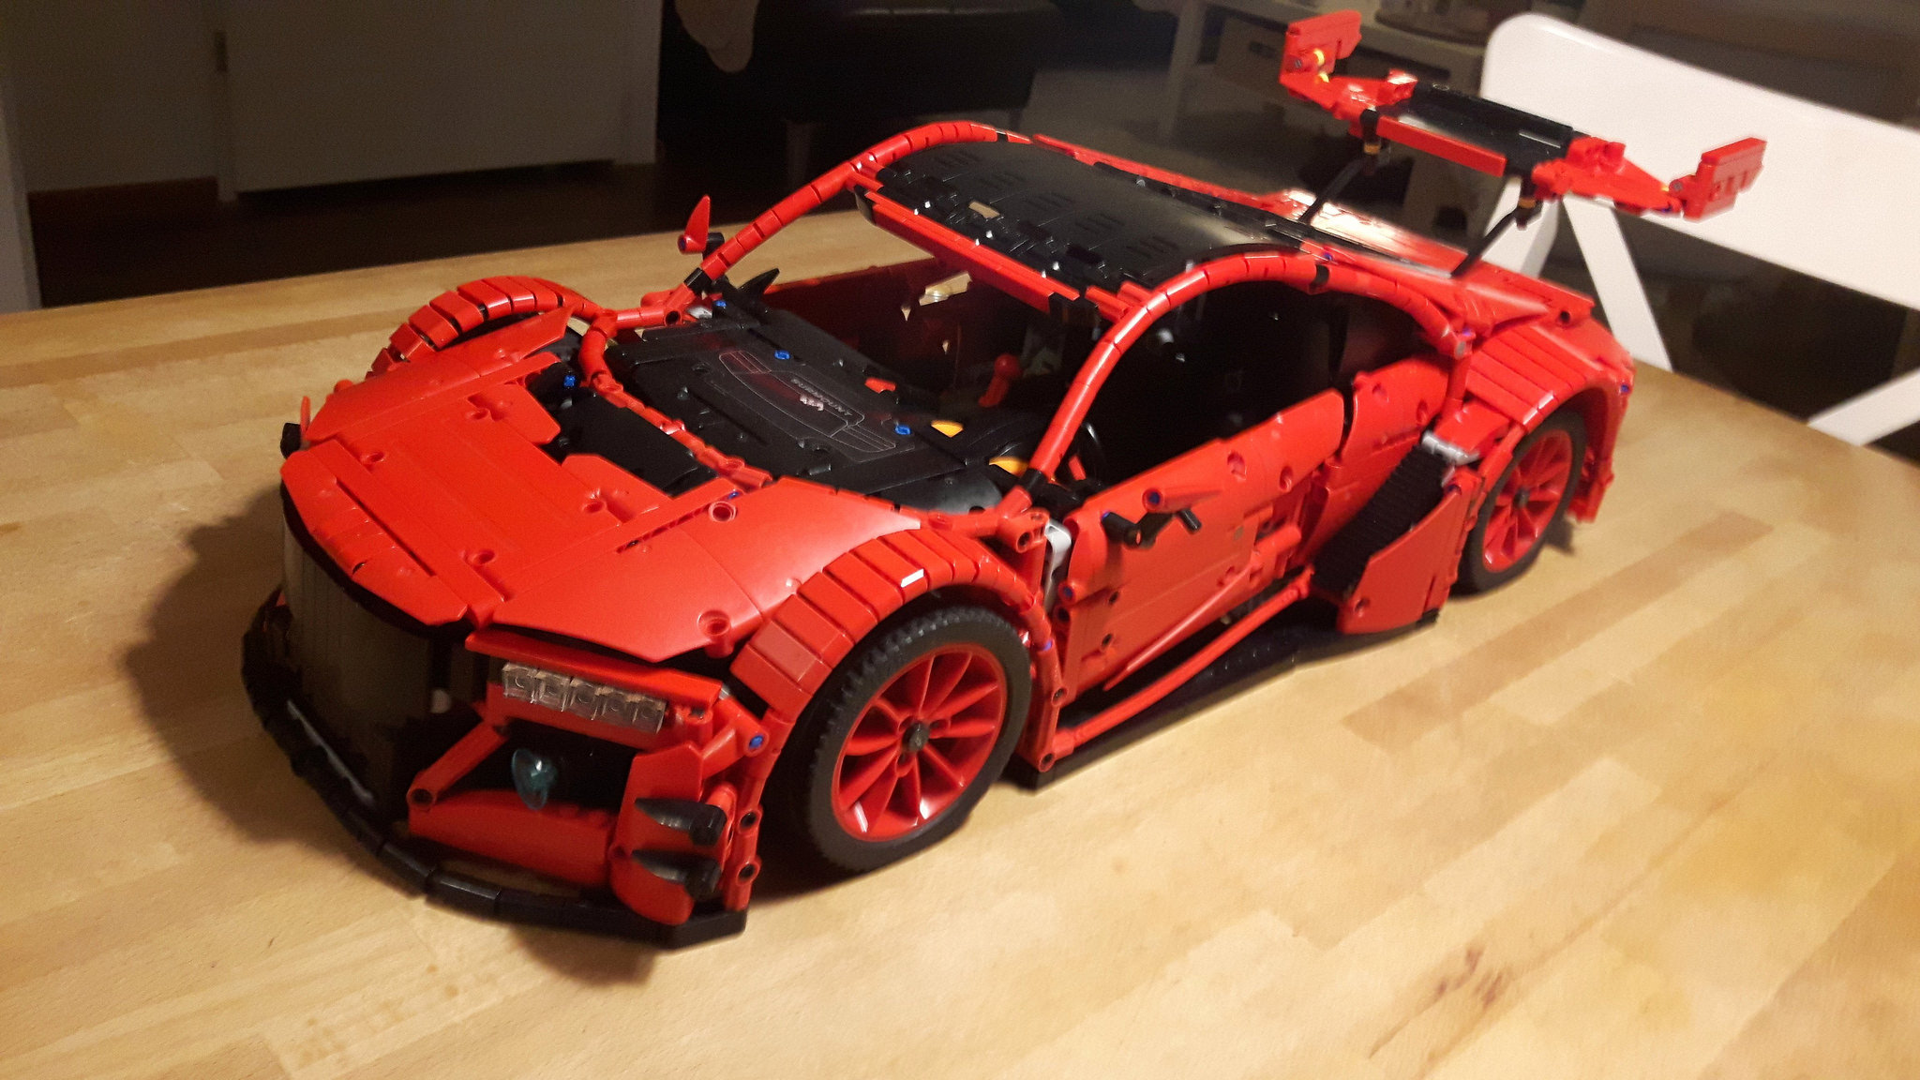 2017 Acura Nsx For Sale >> LEGO MOC-10858 Acura NSX GT3 Bodywork (Technic > Model ...